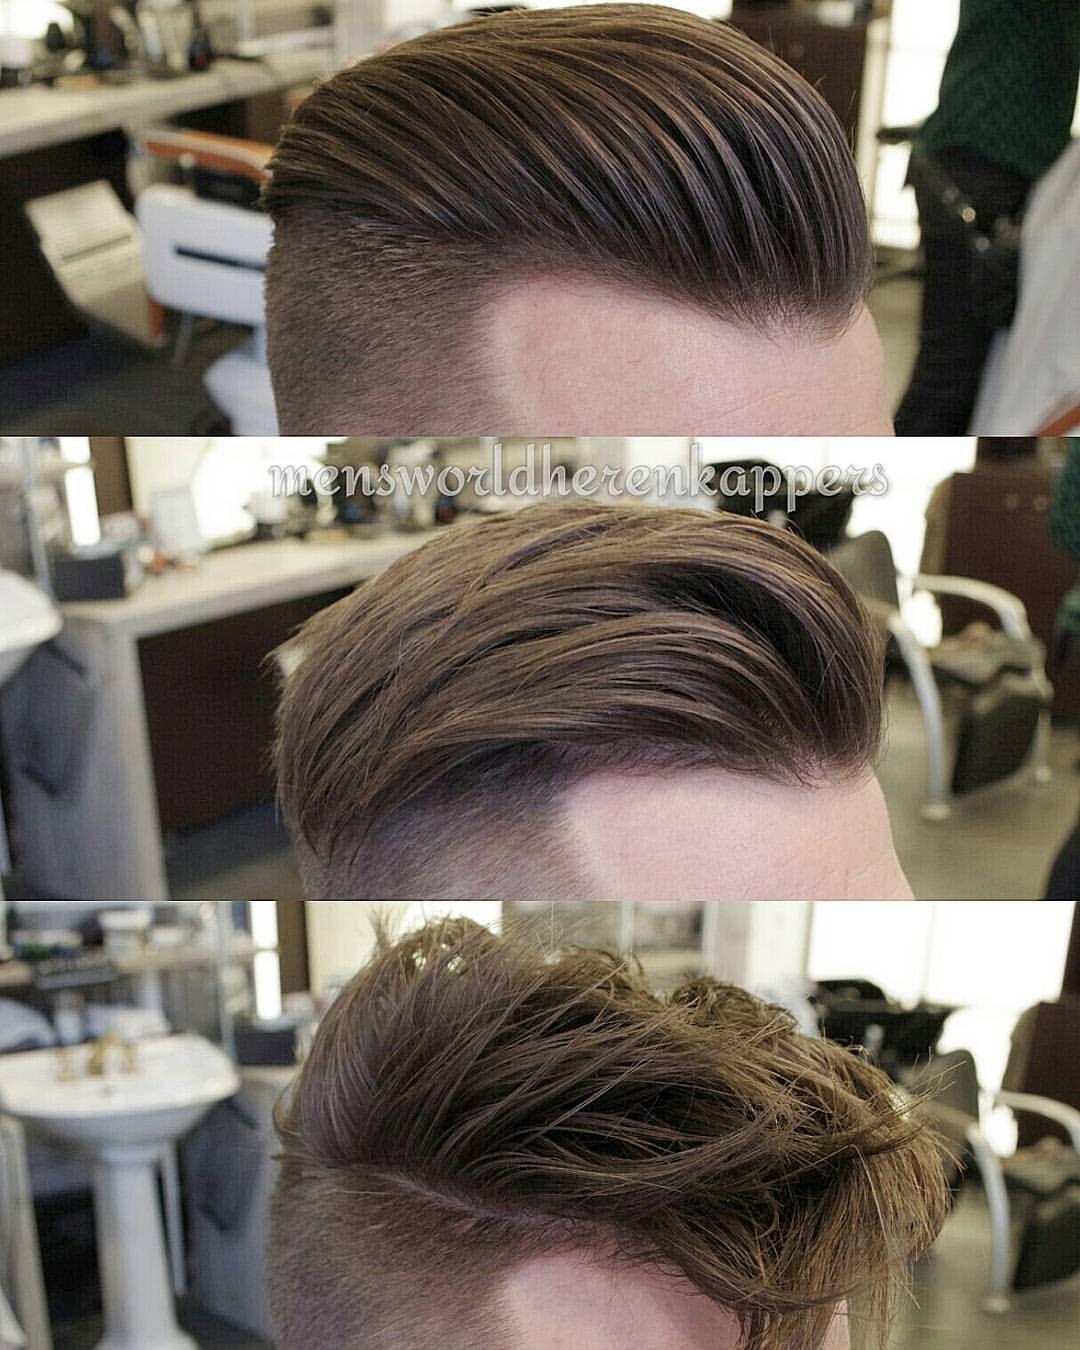 Mens haircut pompadour pin by Àbhíśhêk Ðûbè on hairstyles  pinterest  himalayan salt